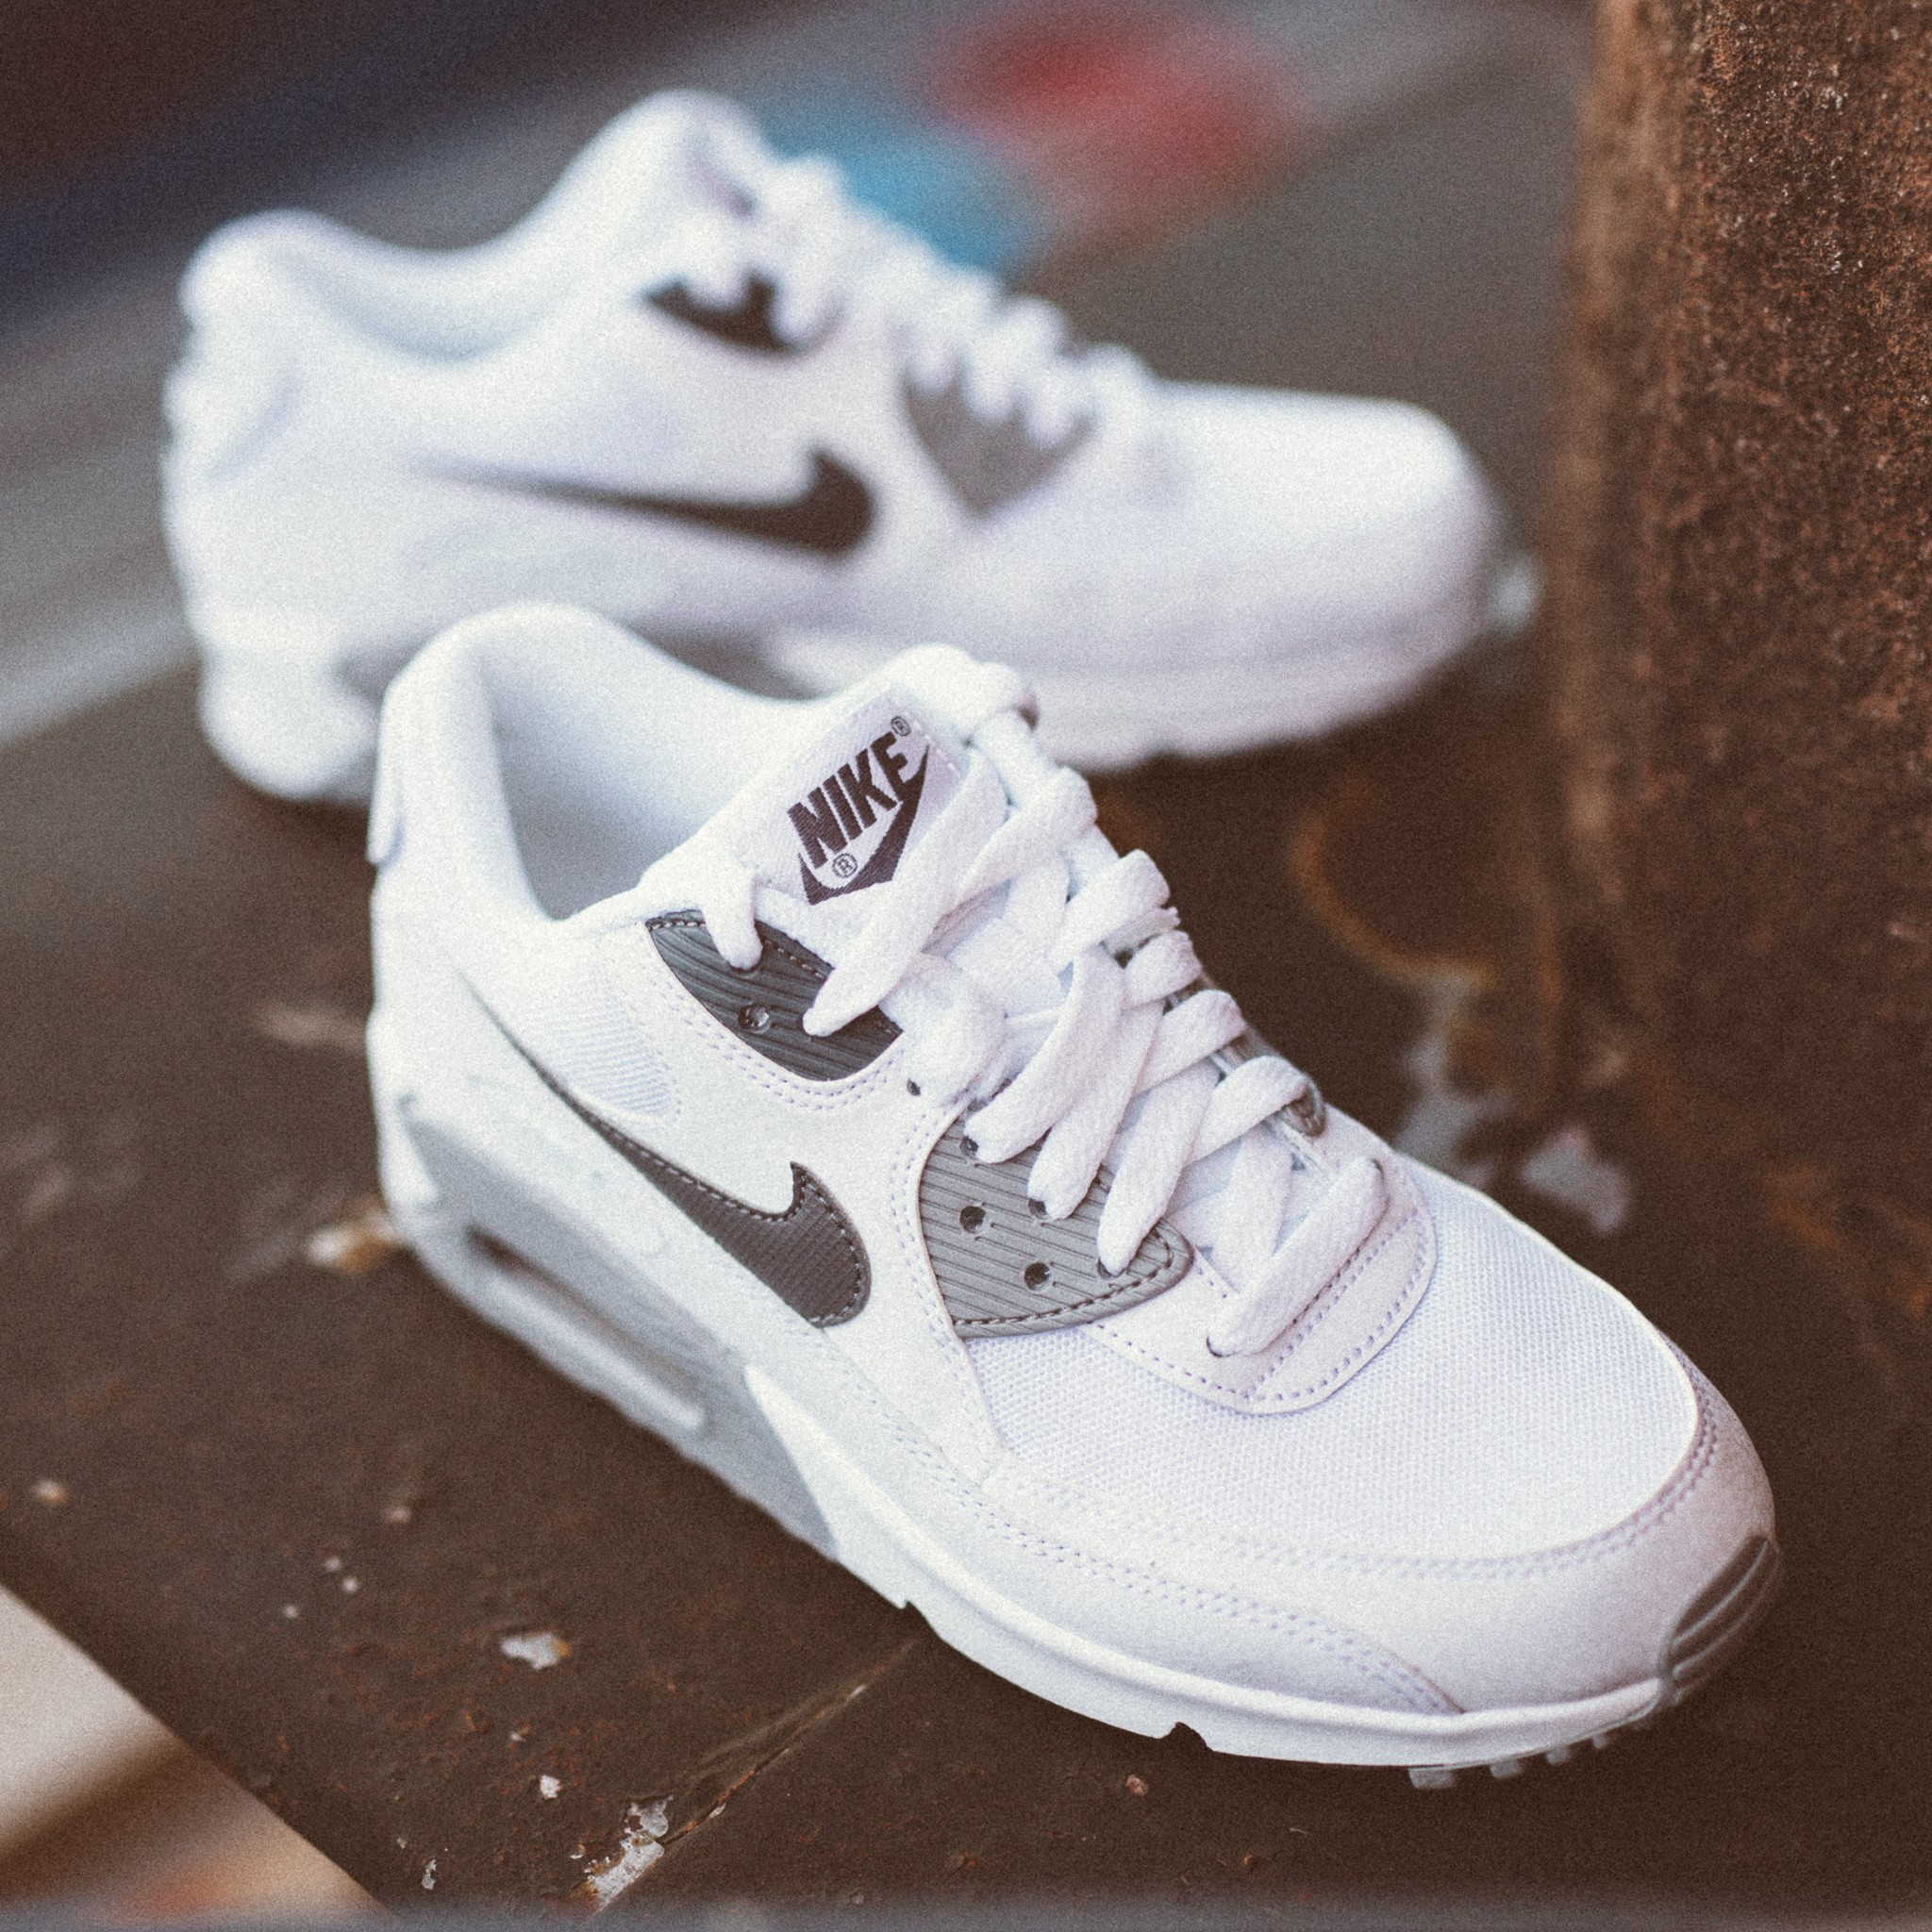 Nike Air Max produktfoto